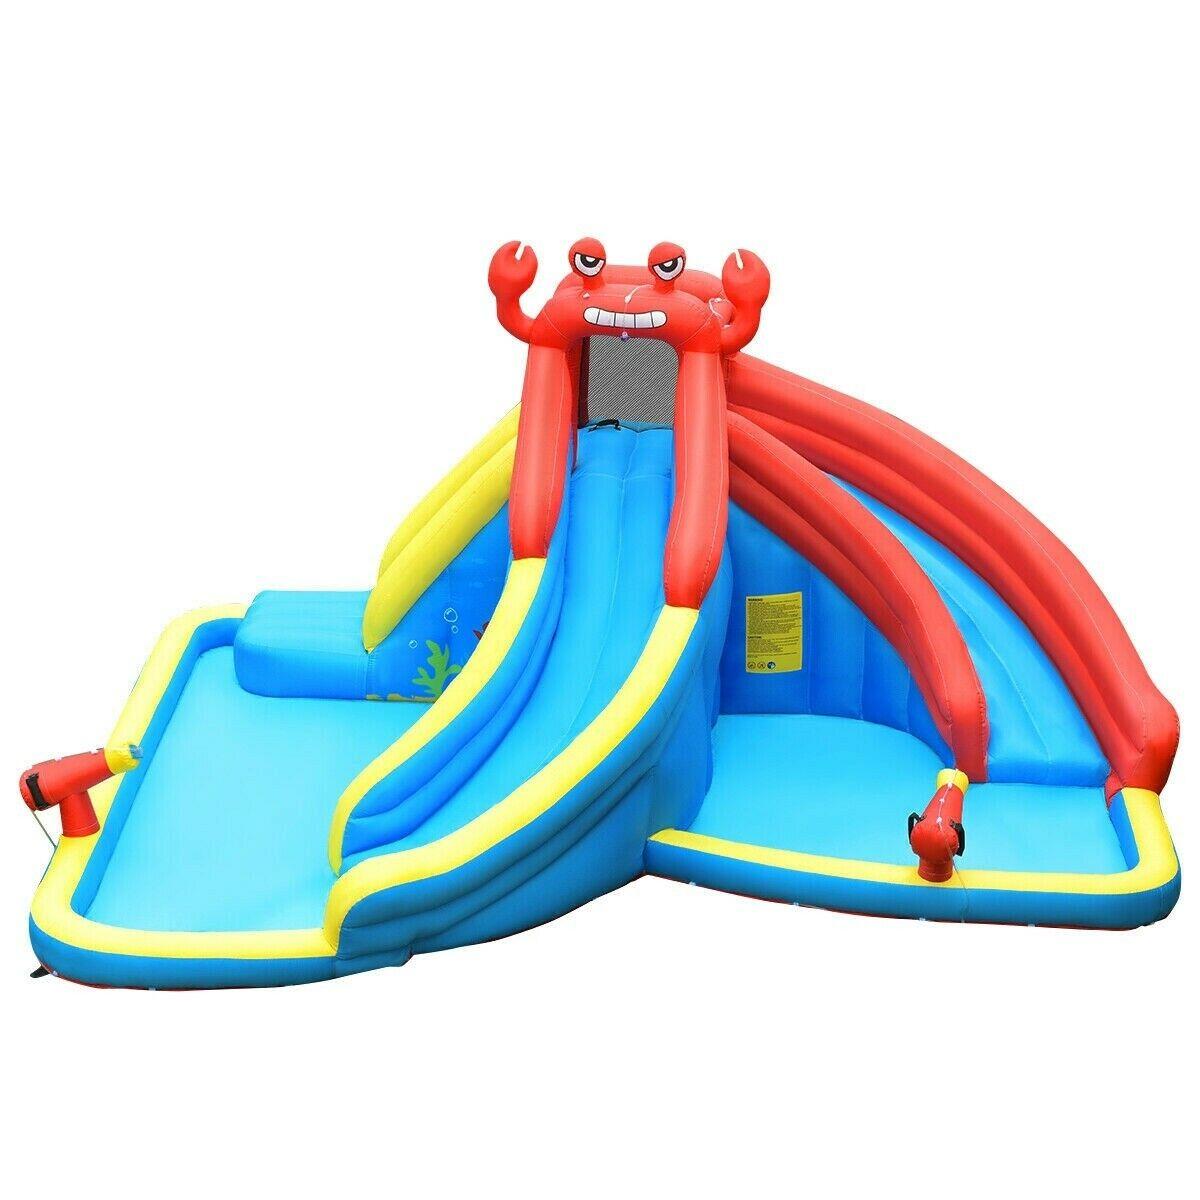 New Big Slide Inflatable Bounce House Castle Kids Jumper Bou